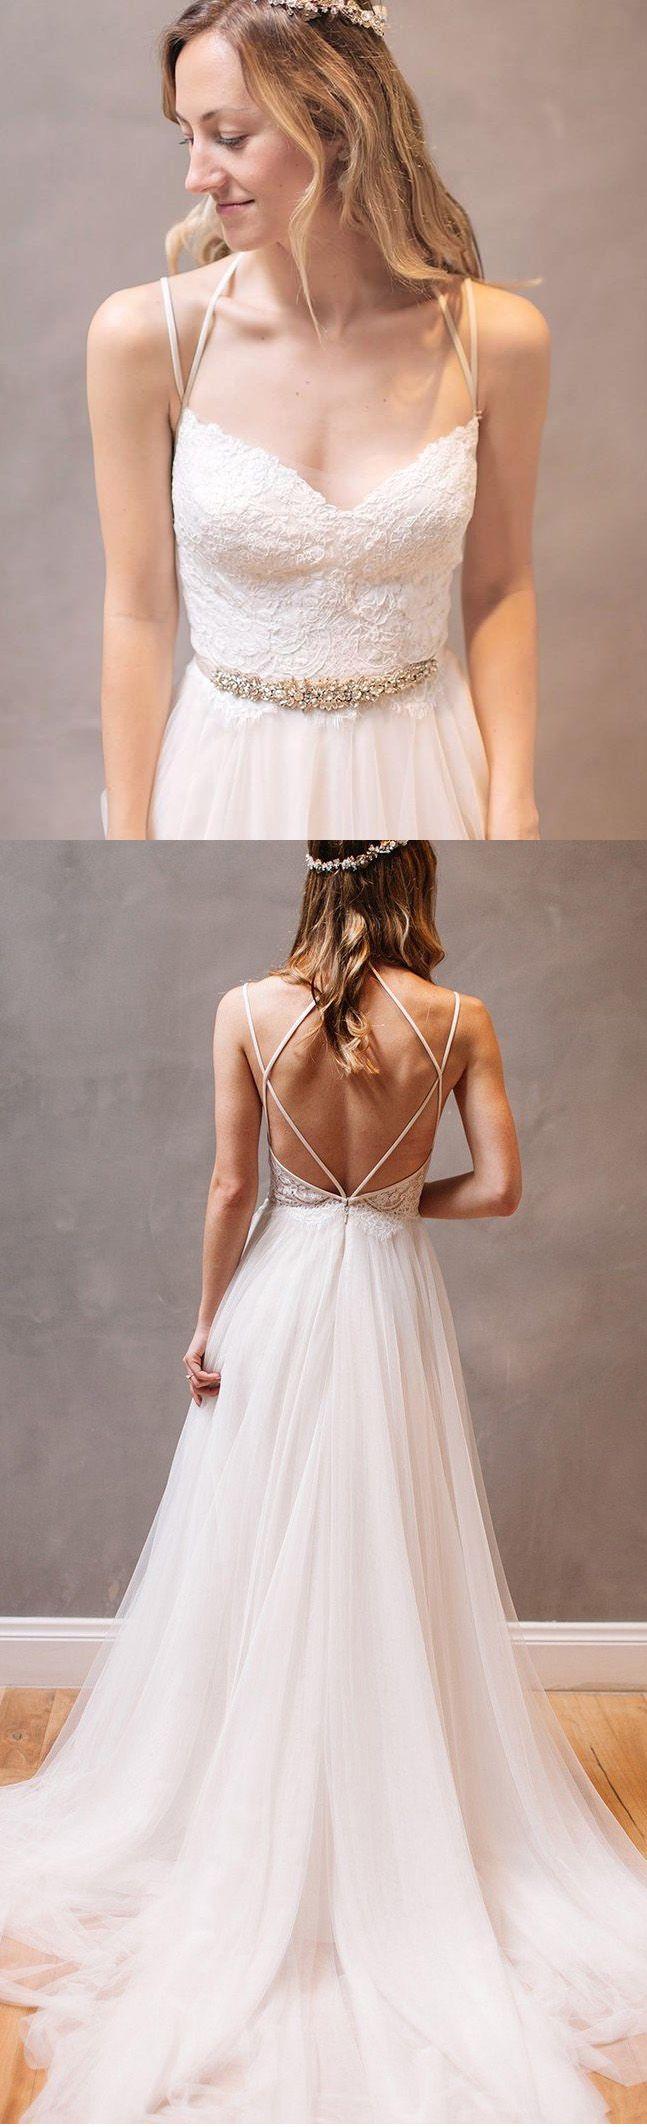 Hot Sale A-line/Princess Wedding Dresses Long White Dresses With ...